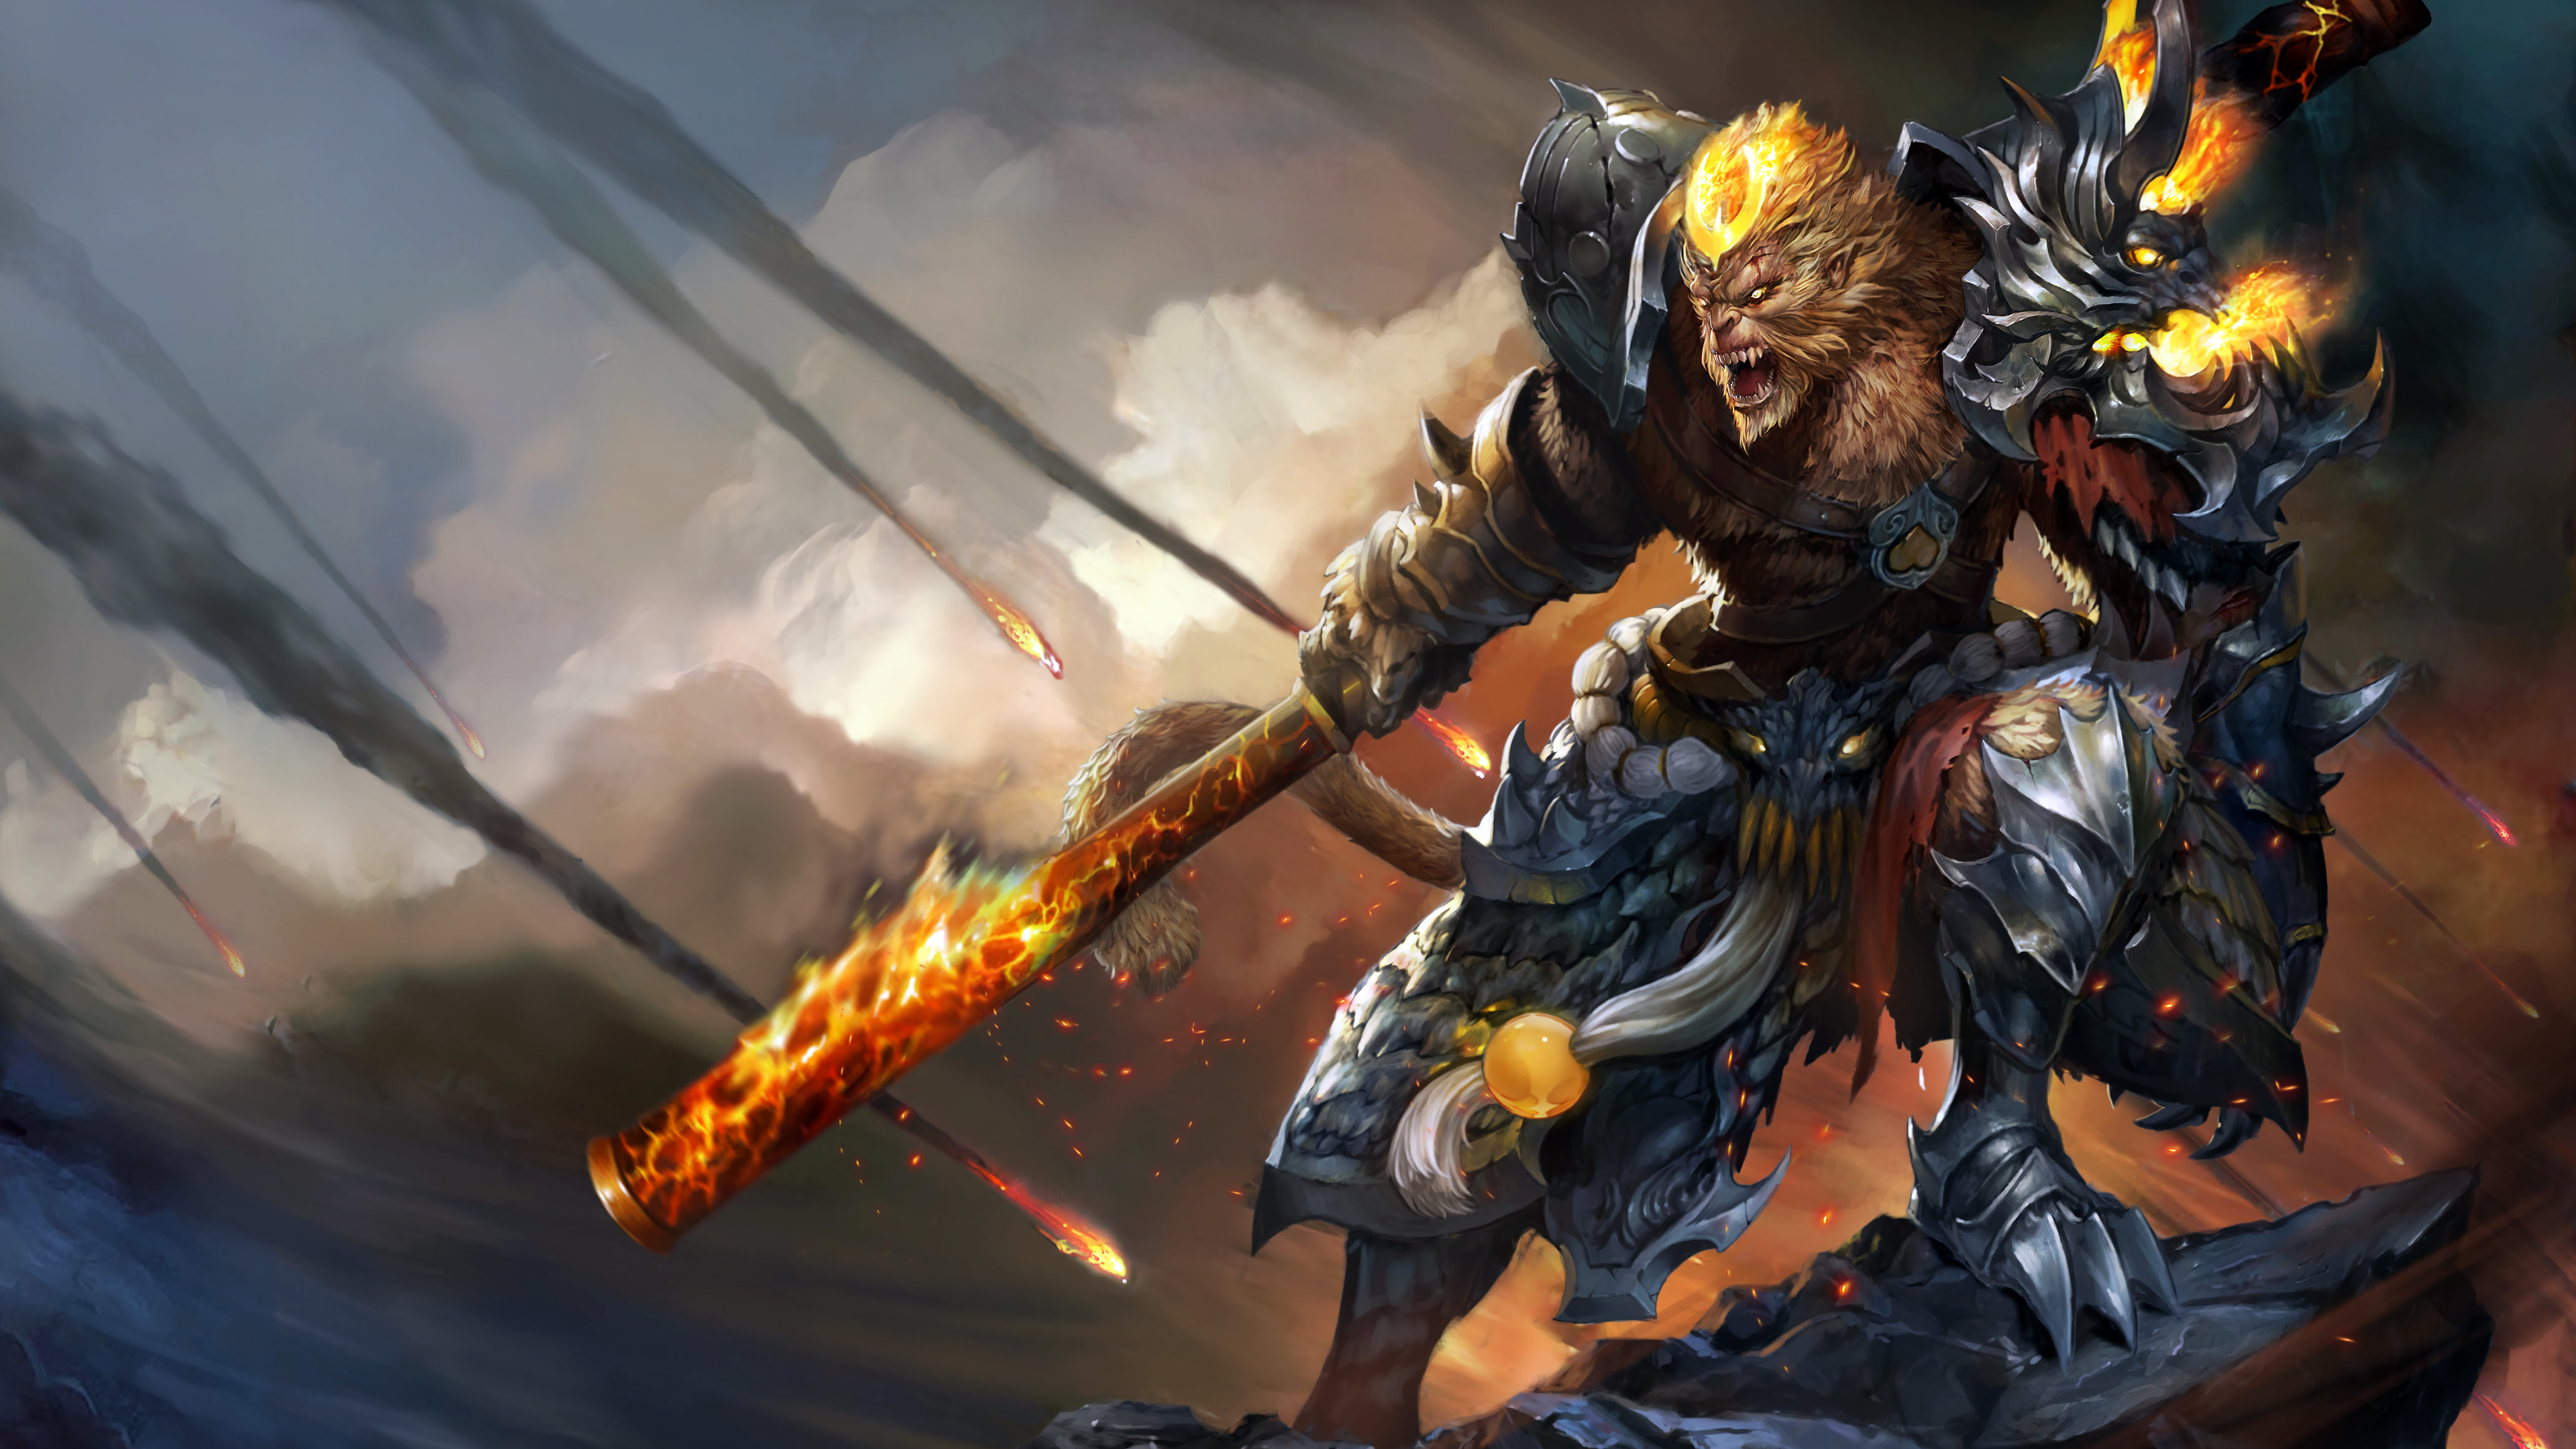 general wukong league of legends artwork 1570392731 - General Wukong League Of Legends Artwork - league of legends wallpapers, hd-wallpapers, games wallpapers, digital art wallpapers, artwork wallpapers, artist wallpapers, 4k-wallpapers